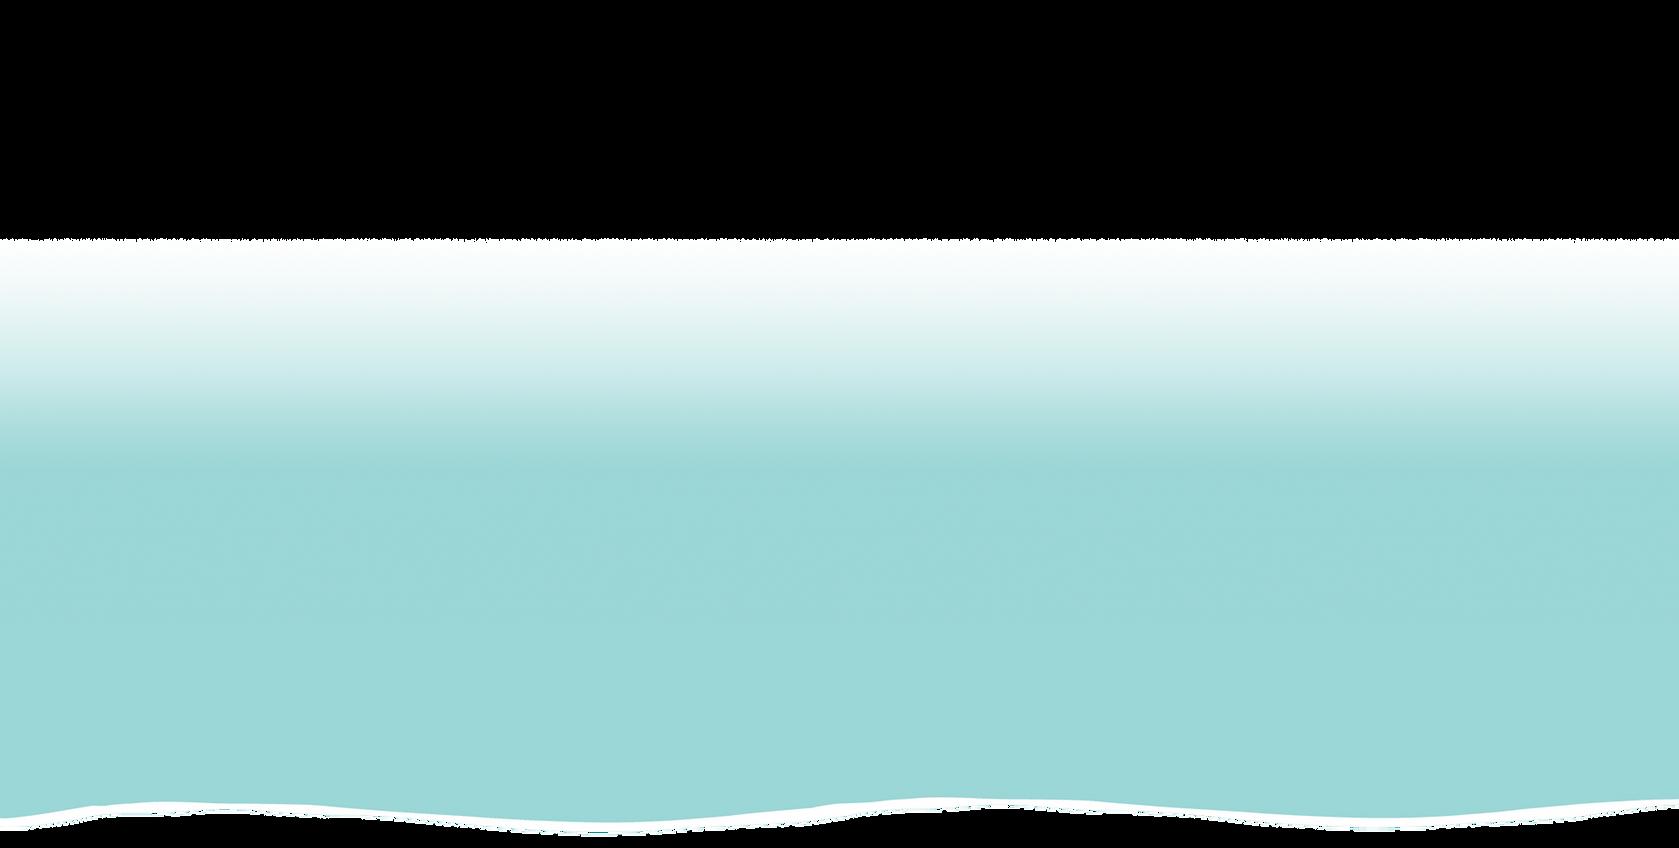 aqua-gradient-strip-white-water.png